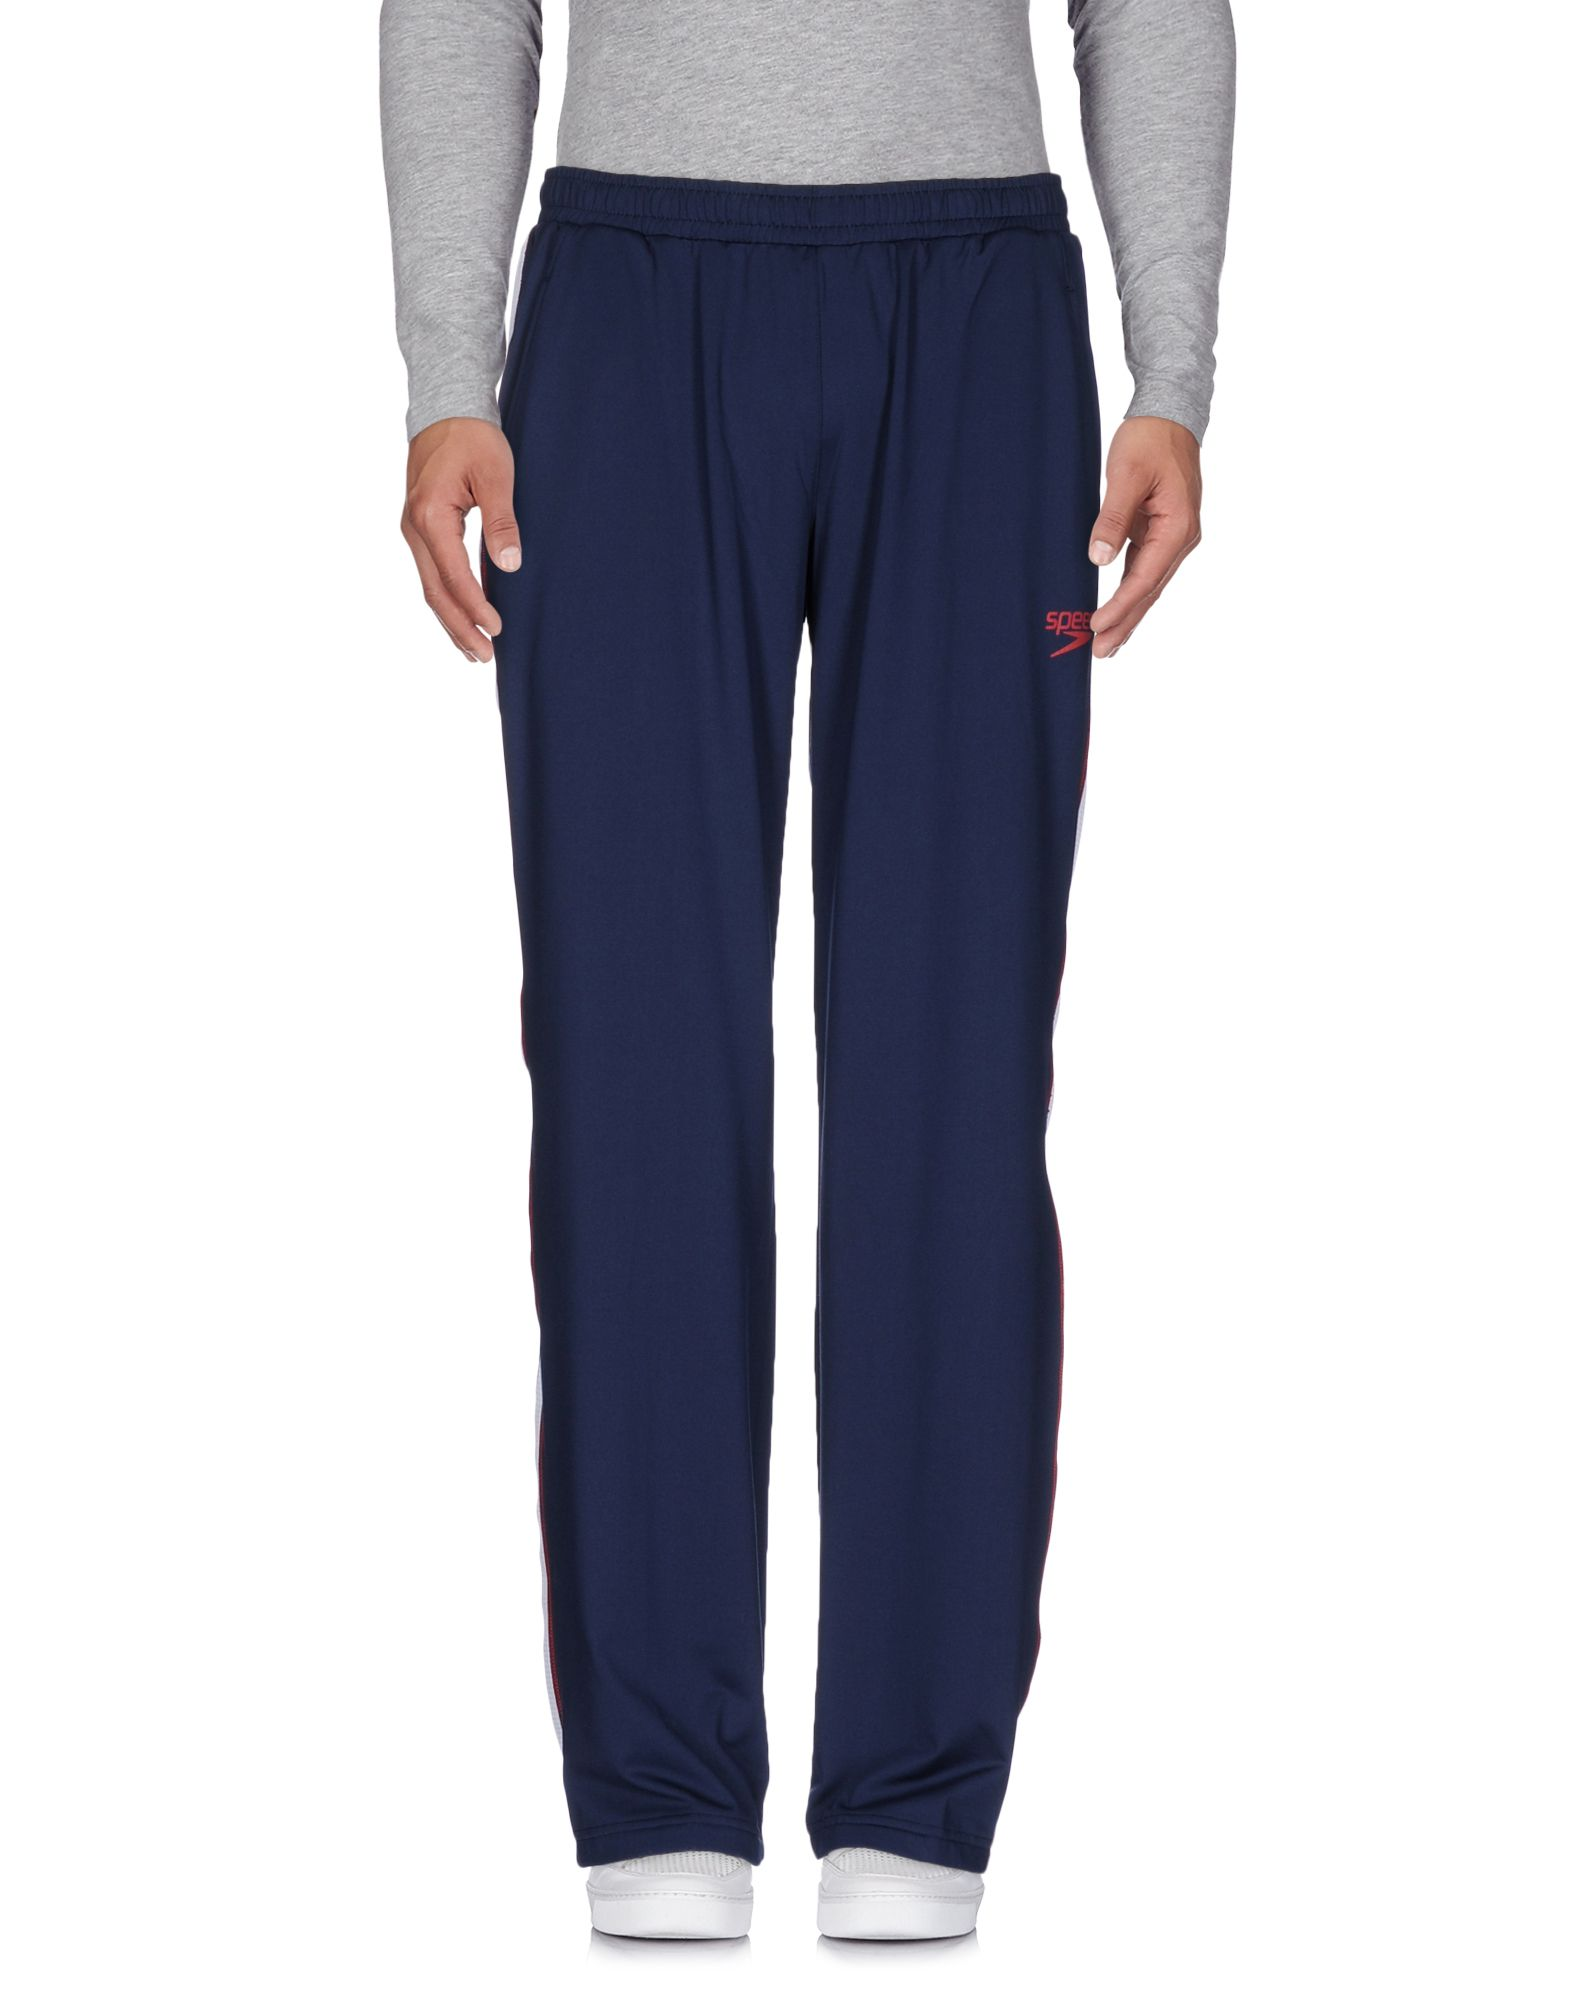 A A A buon mercato Pantalone Speedo Uomo - 36889355FD 22d570